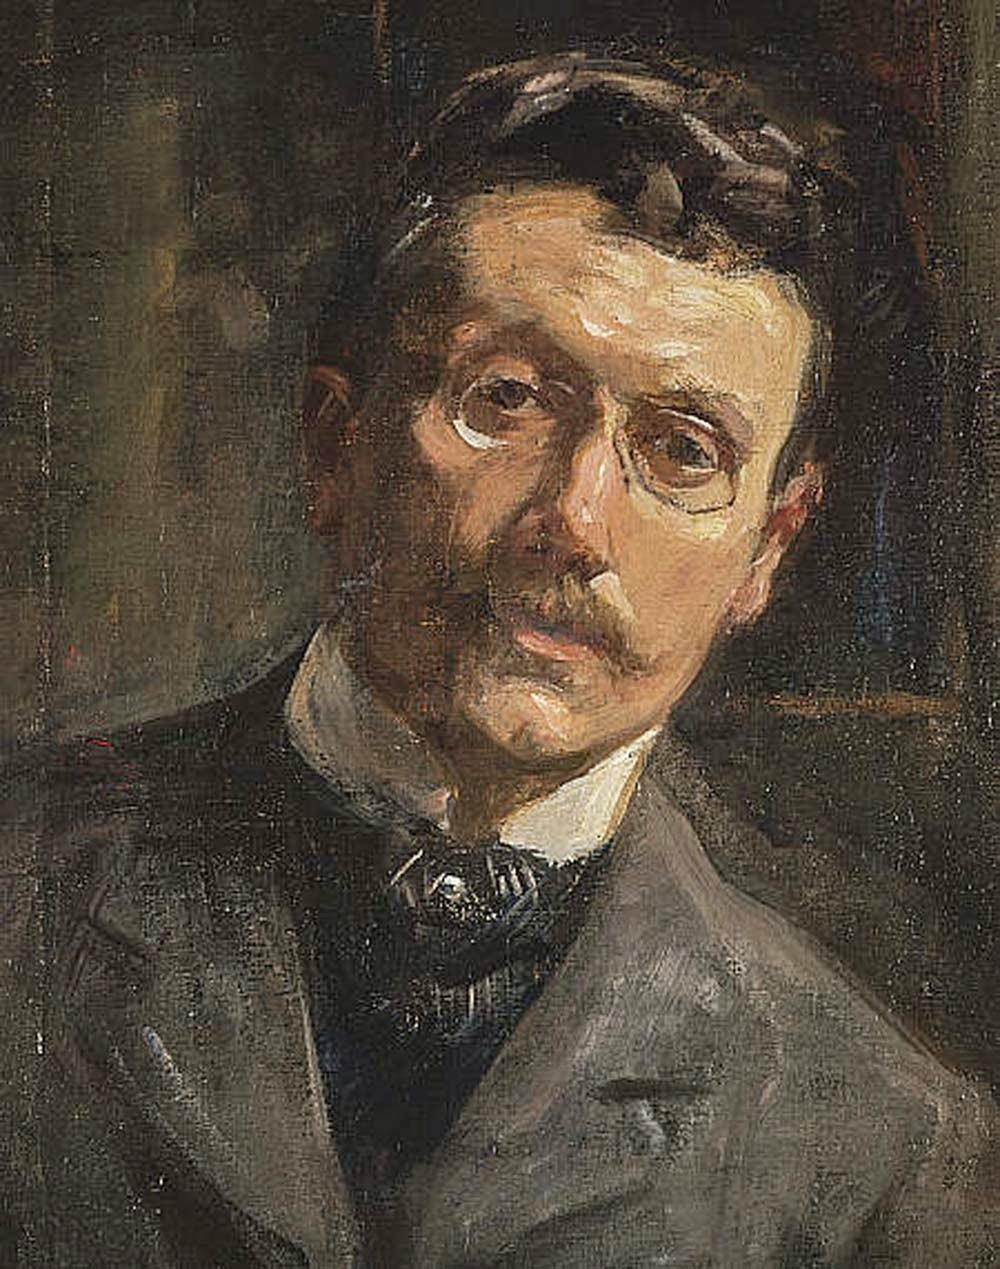 Alexander Ignatius Roche